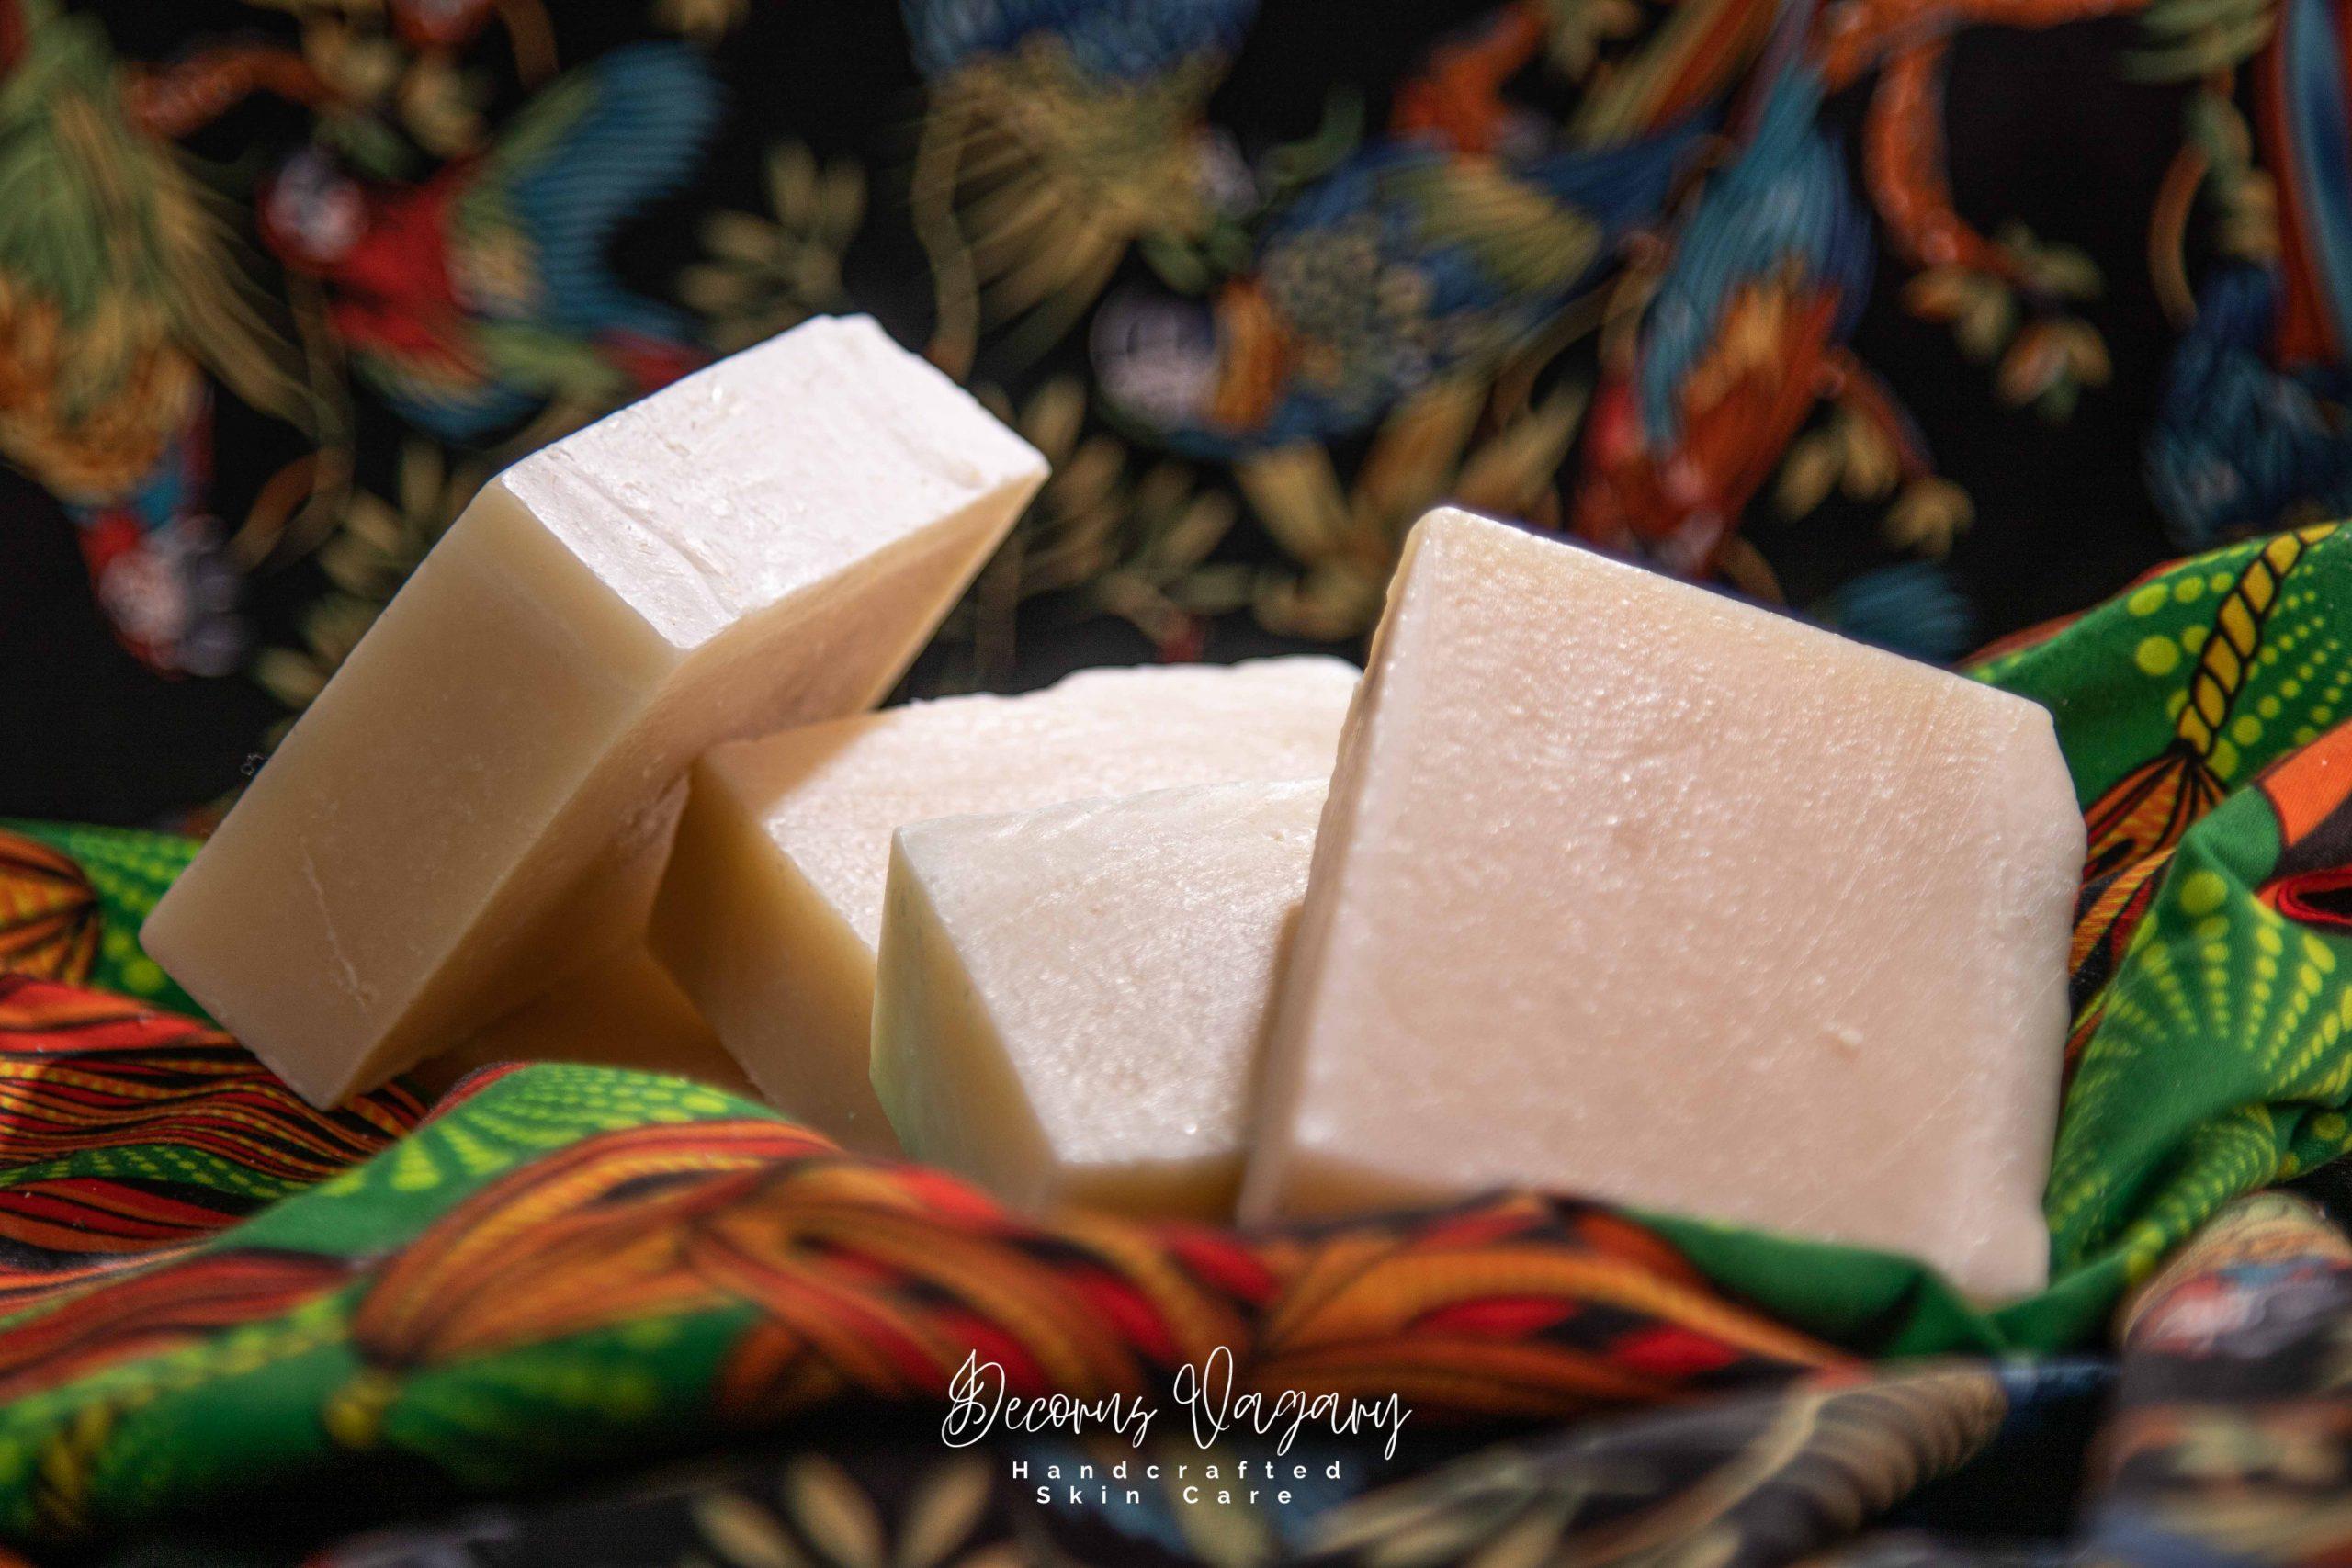 Decorus vagary garri soap on African print.